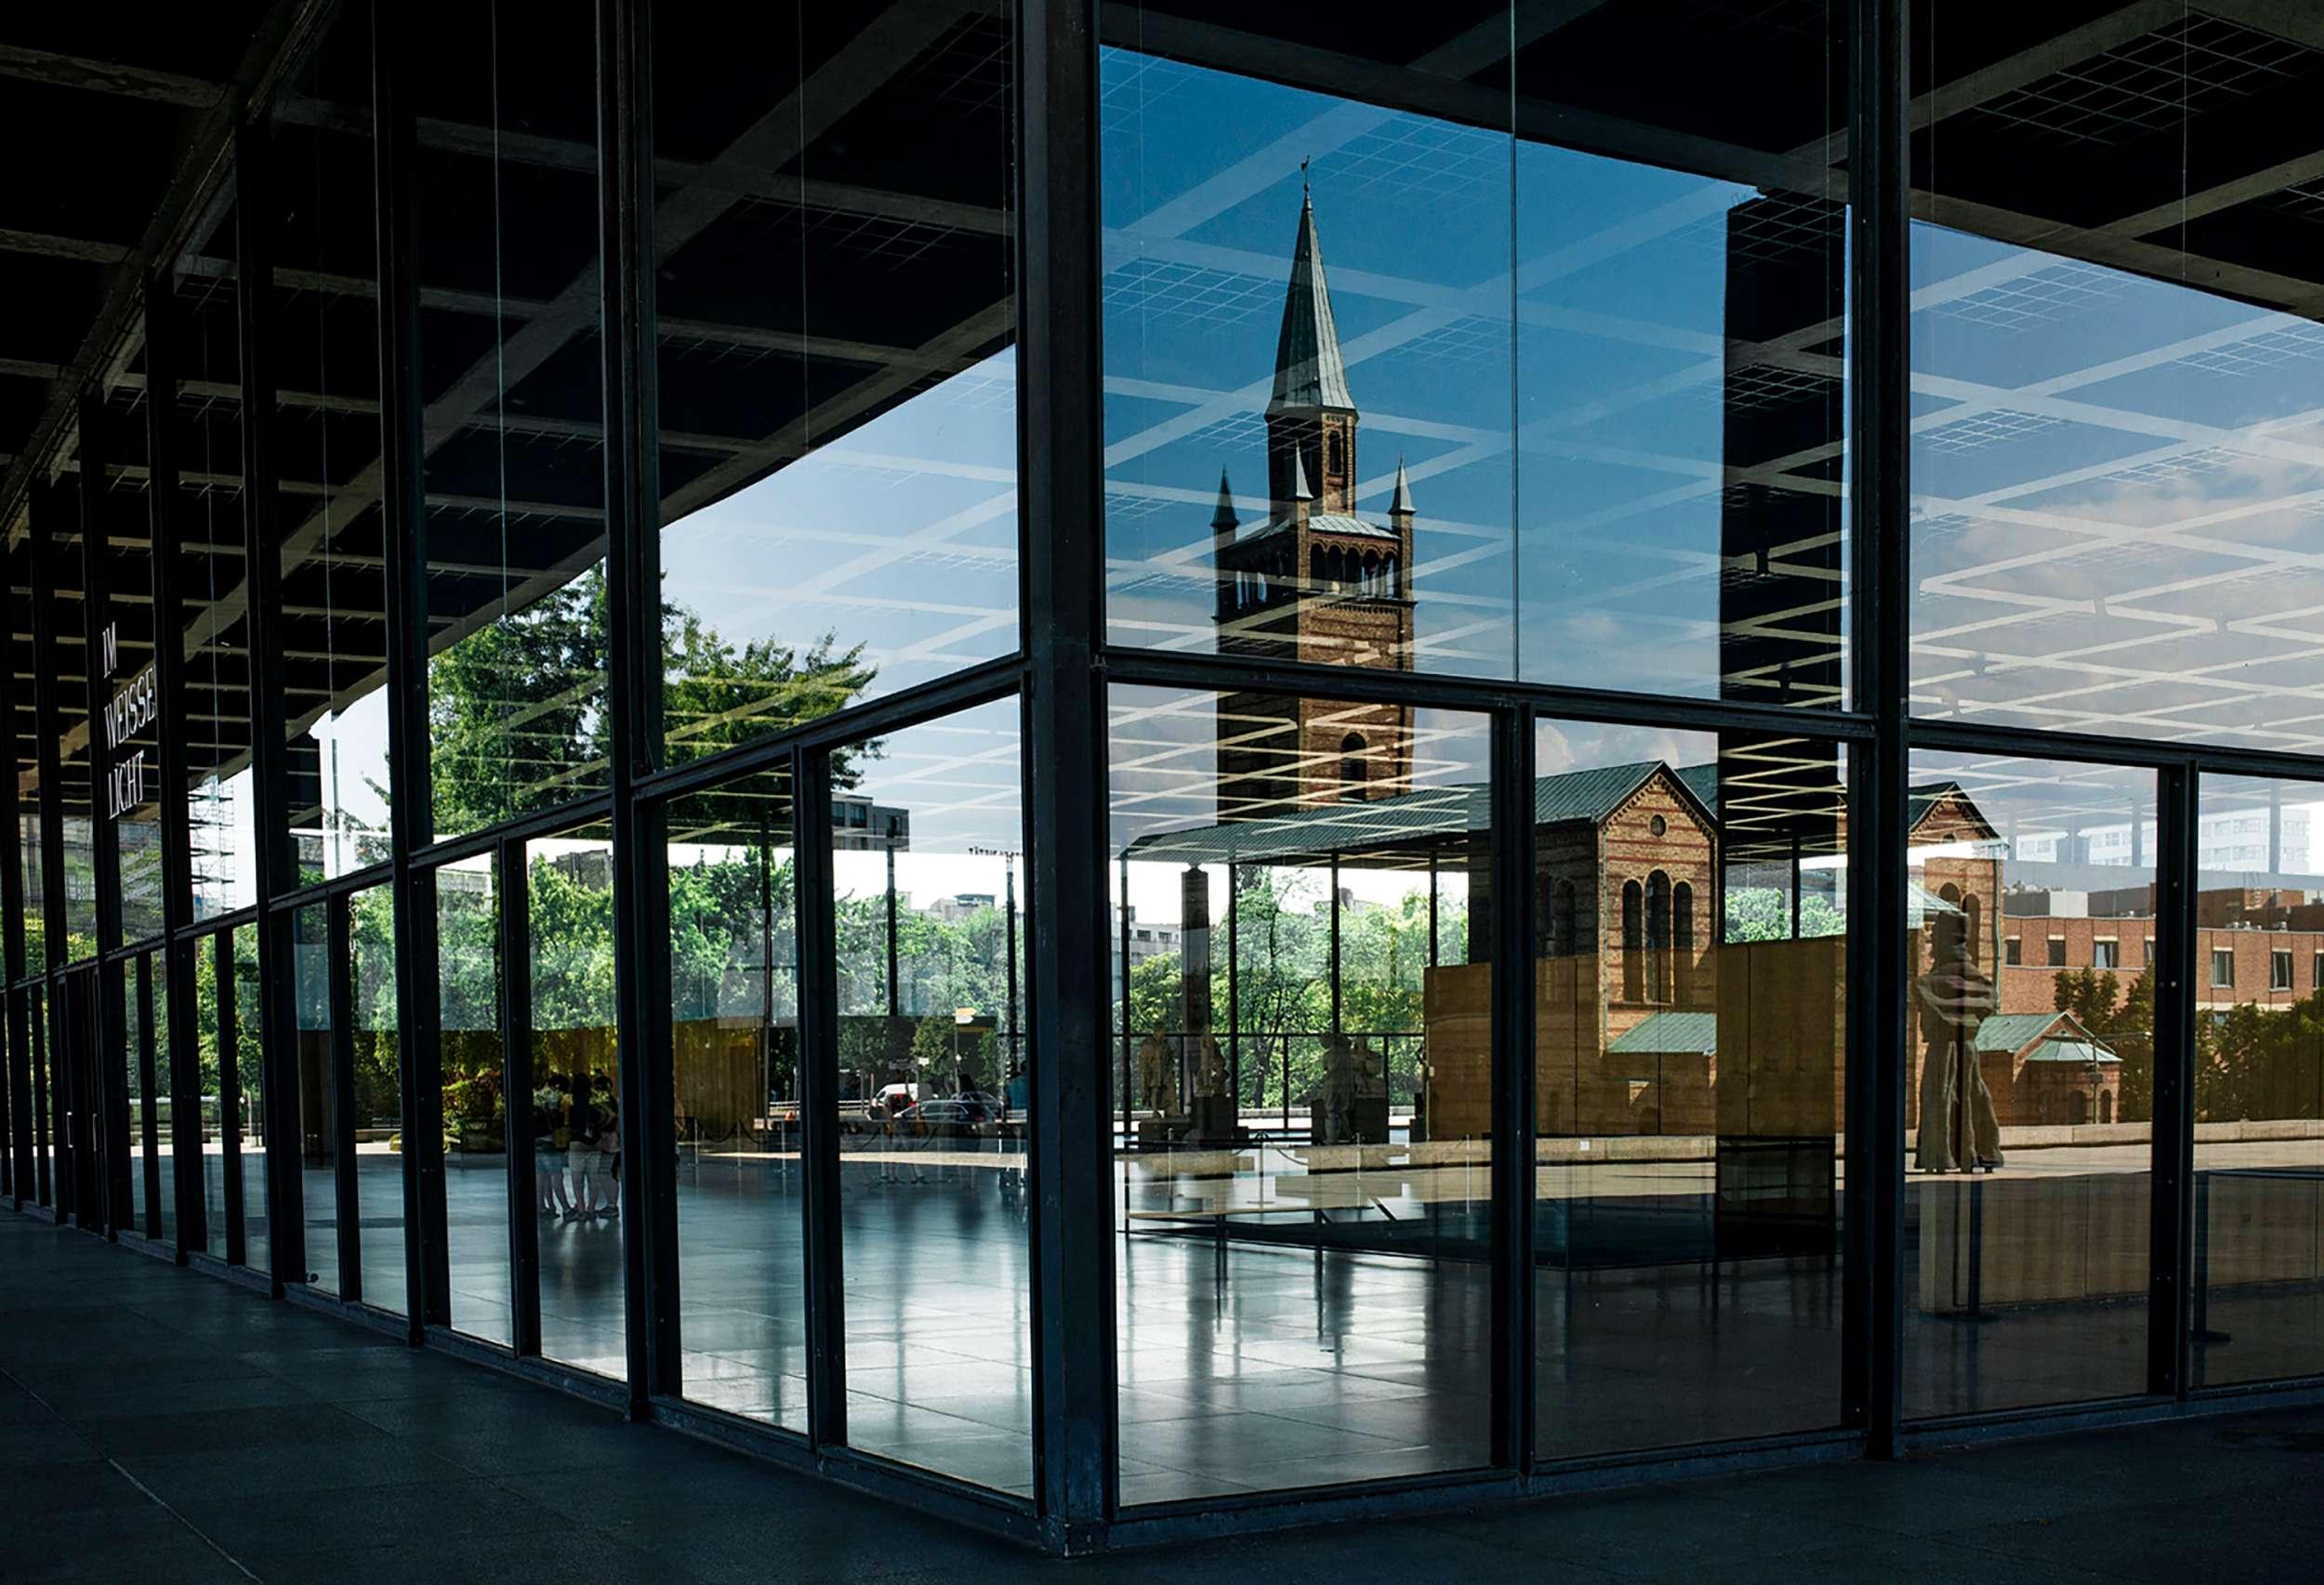 Neue Nationalgalerie 1 Berlin